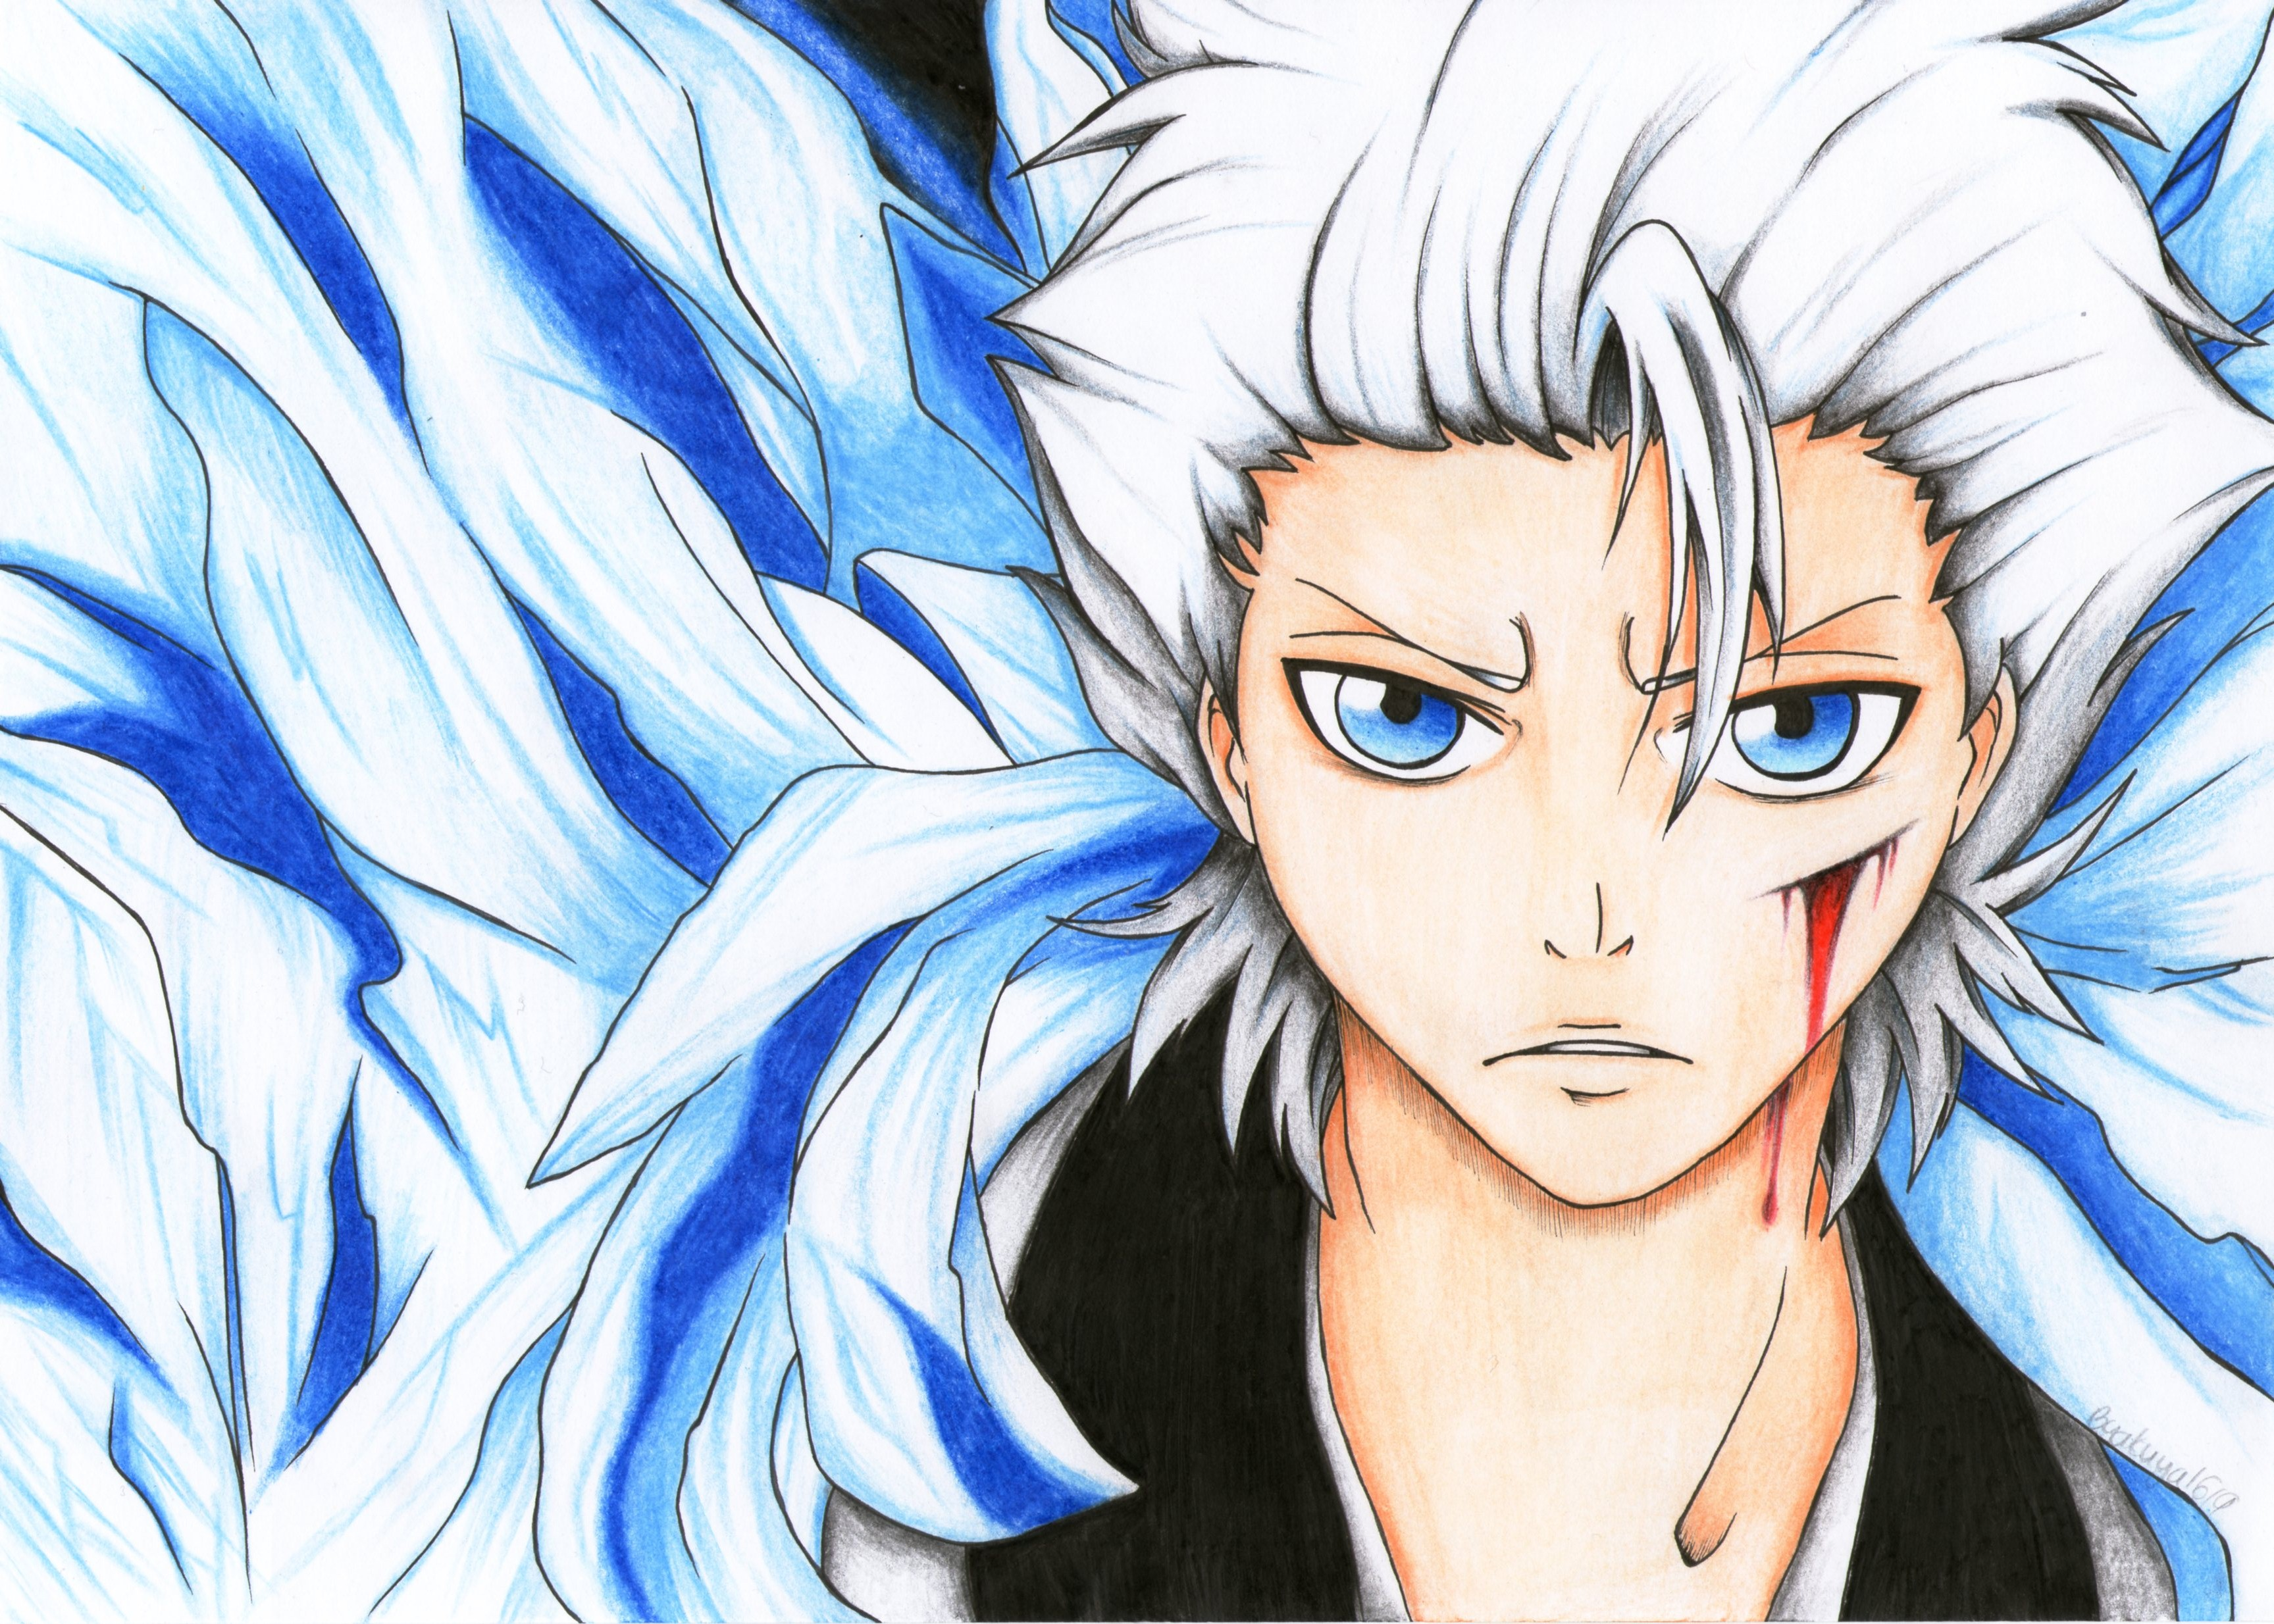 Image Result For Anime Pictures Deviantart